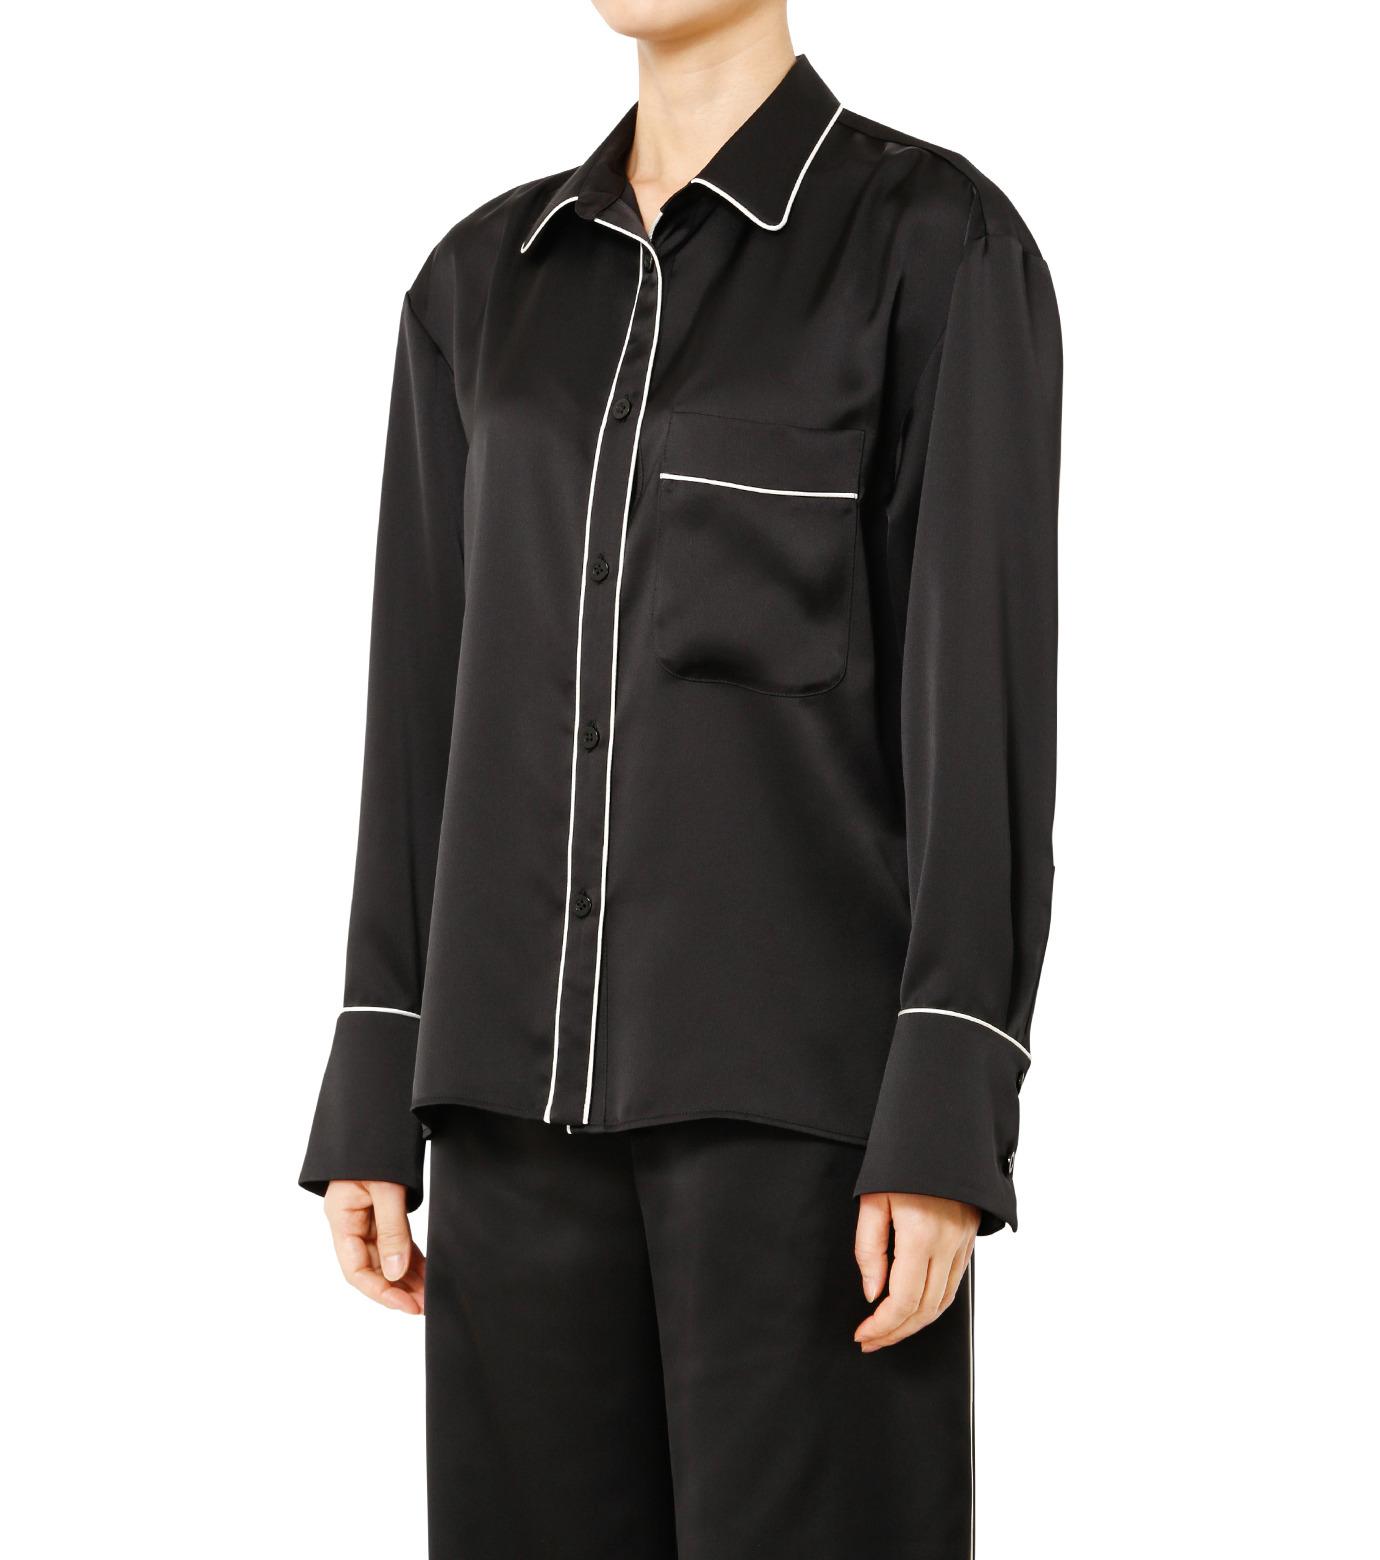 LE CIEL BLEU(ルシェルブルー)のパジャマルックシャツ-BLACK(シャツ/shirt)-19S63101 拡大詳細画像3